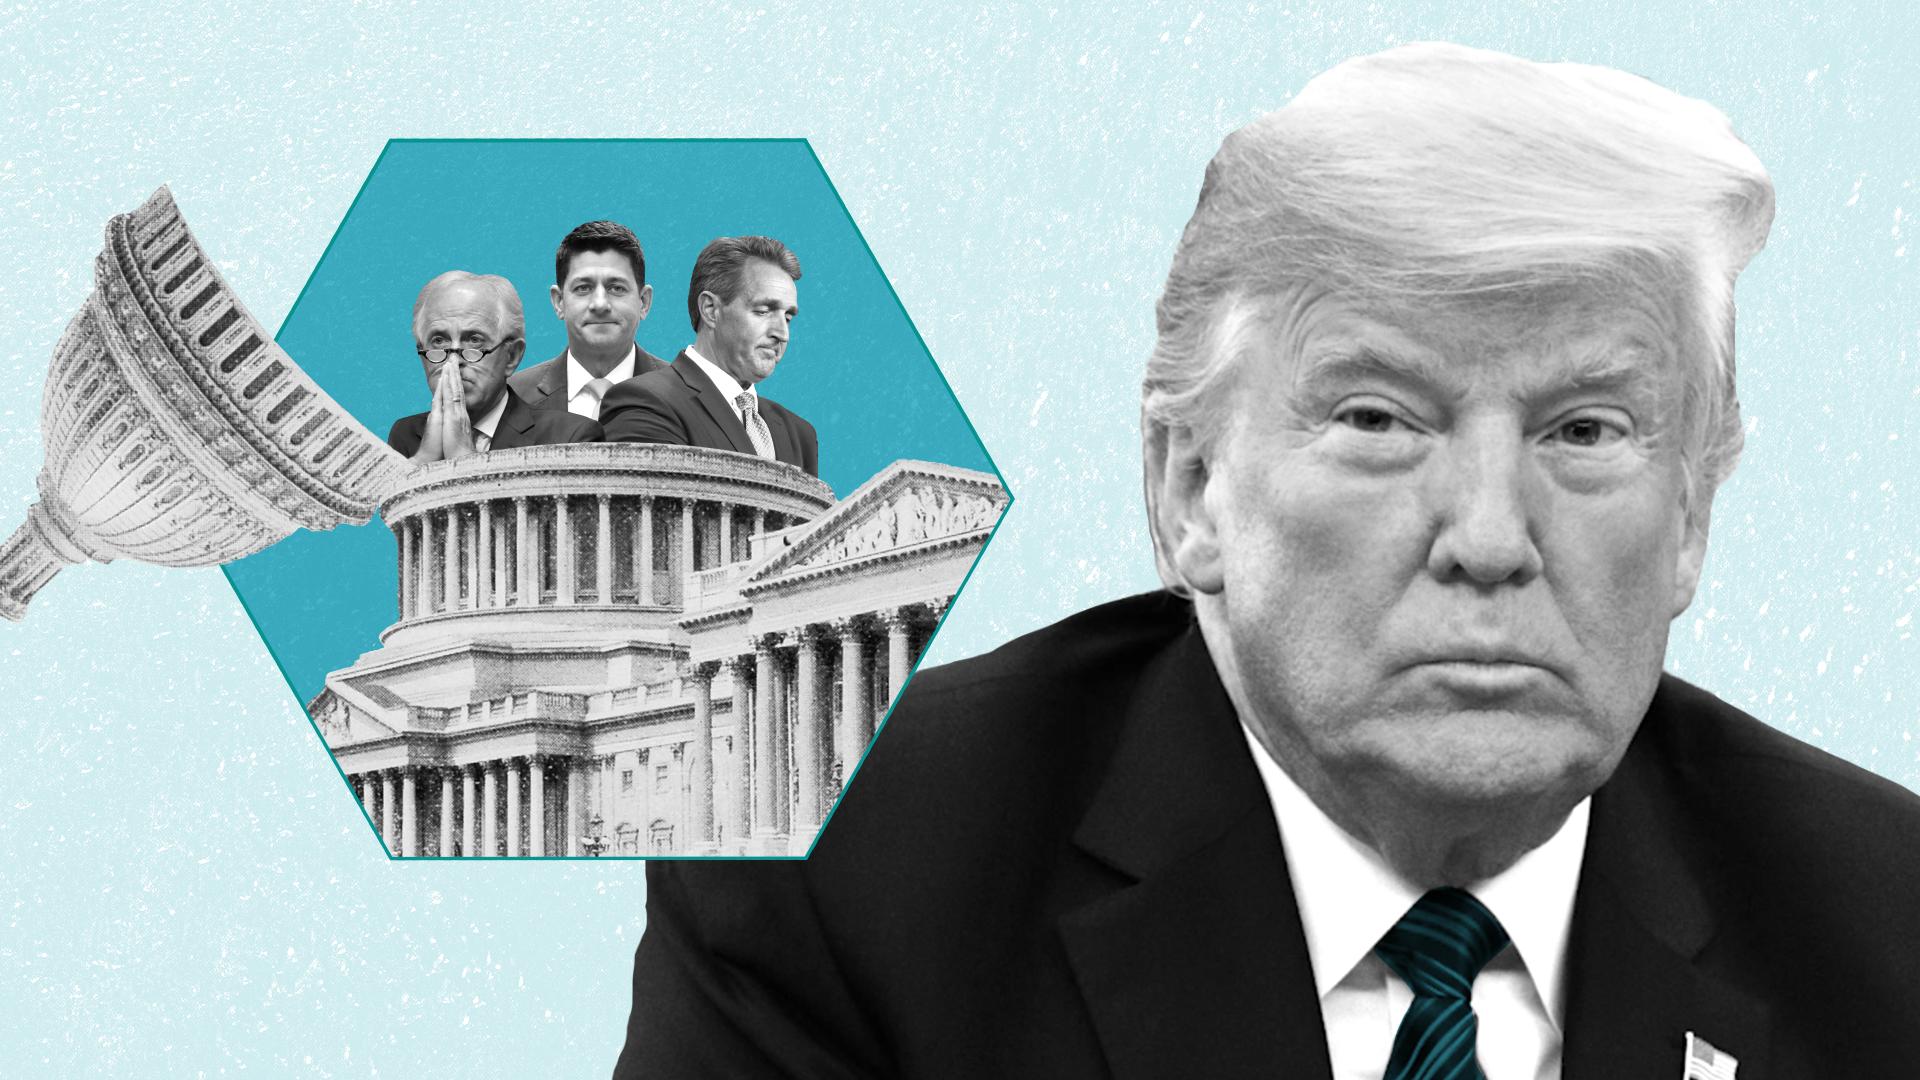 The dark side of American conservatism has taken over